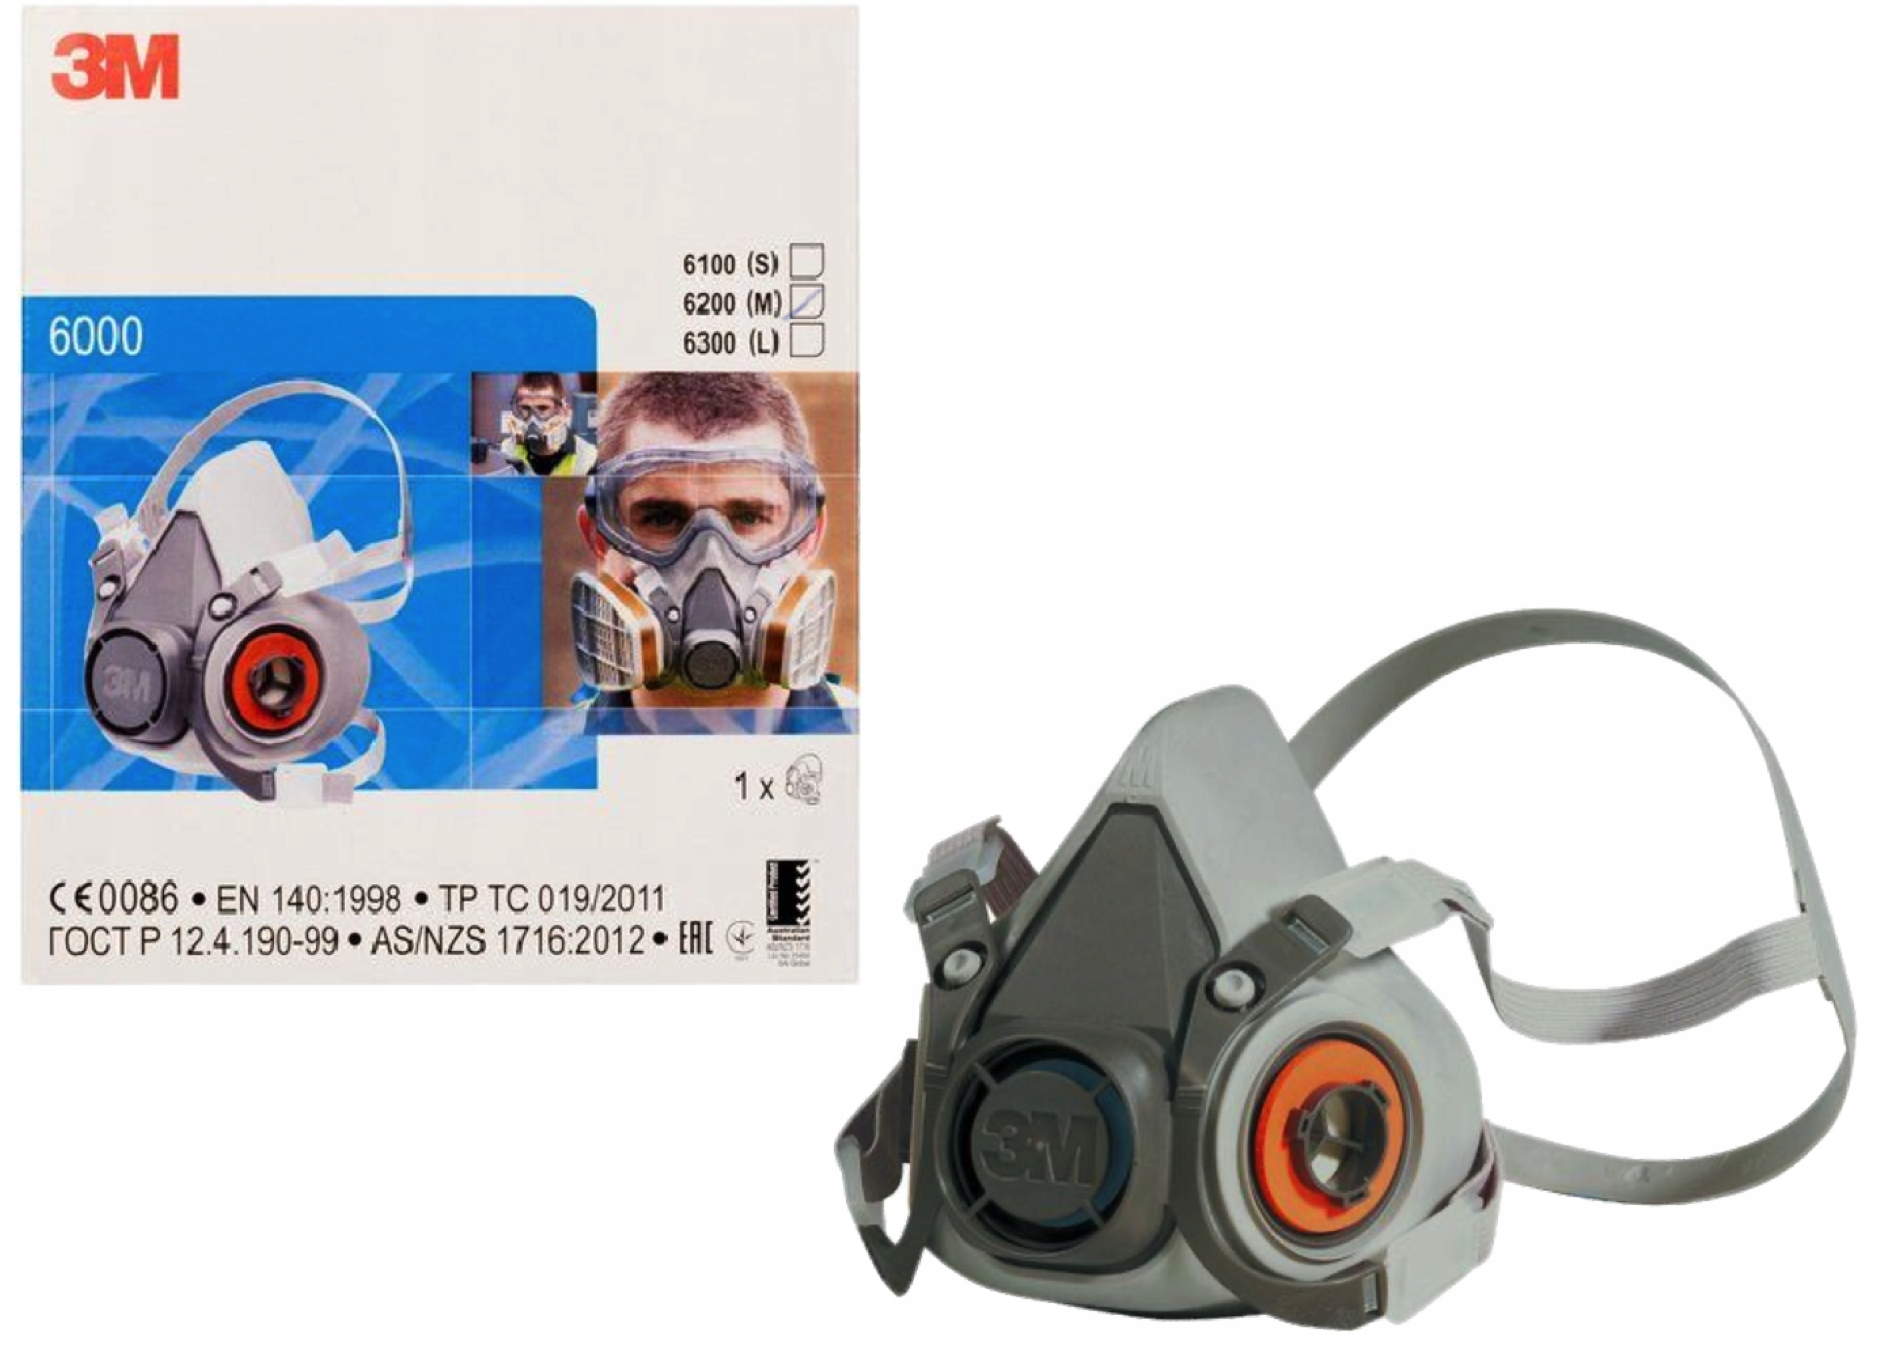 3M Półmaska маска защитная краска 6200 M EU